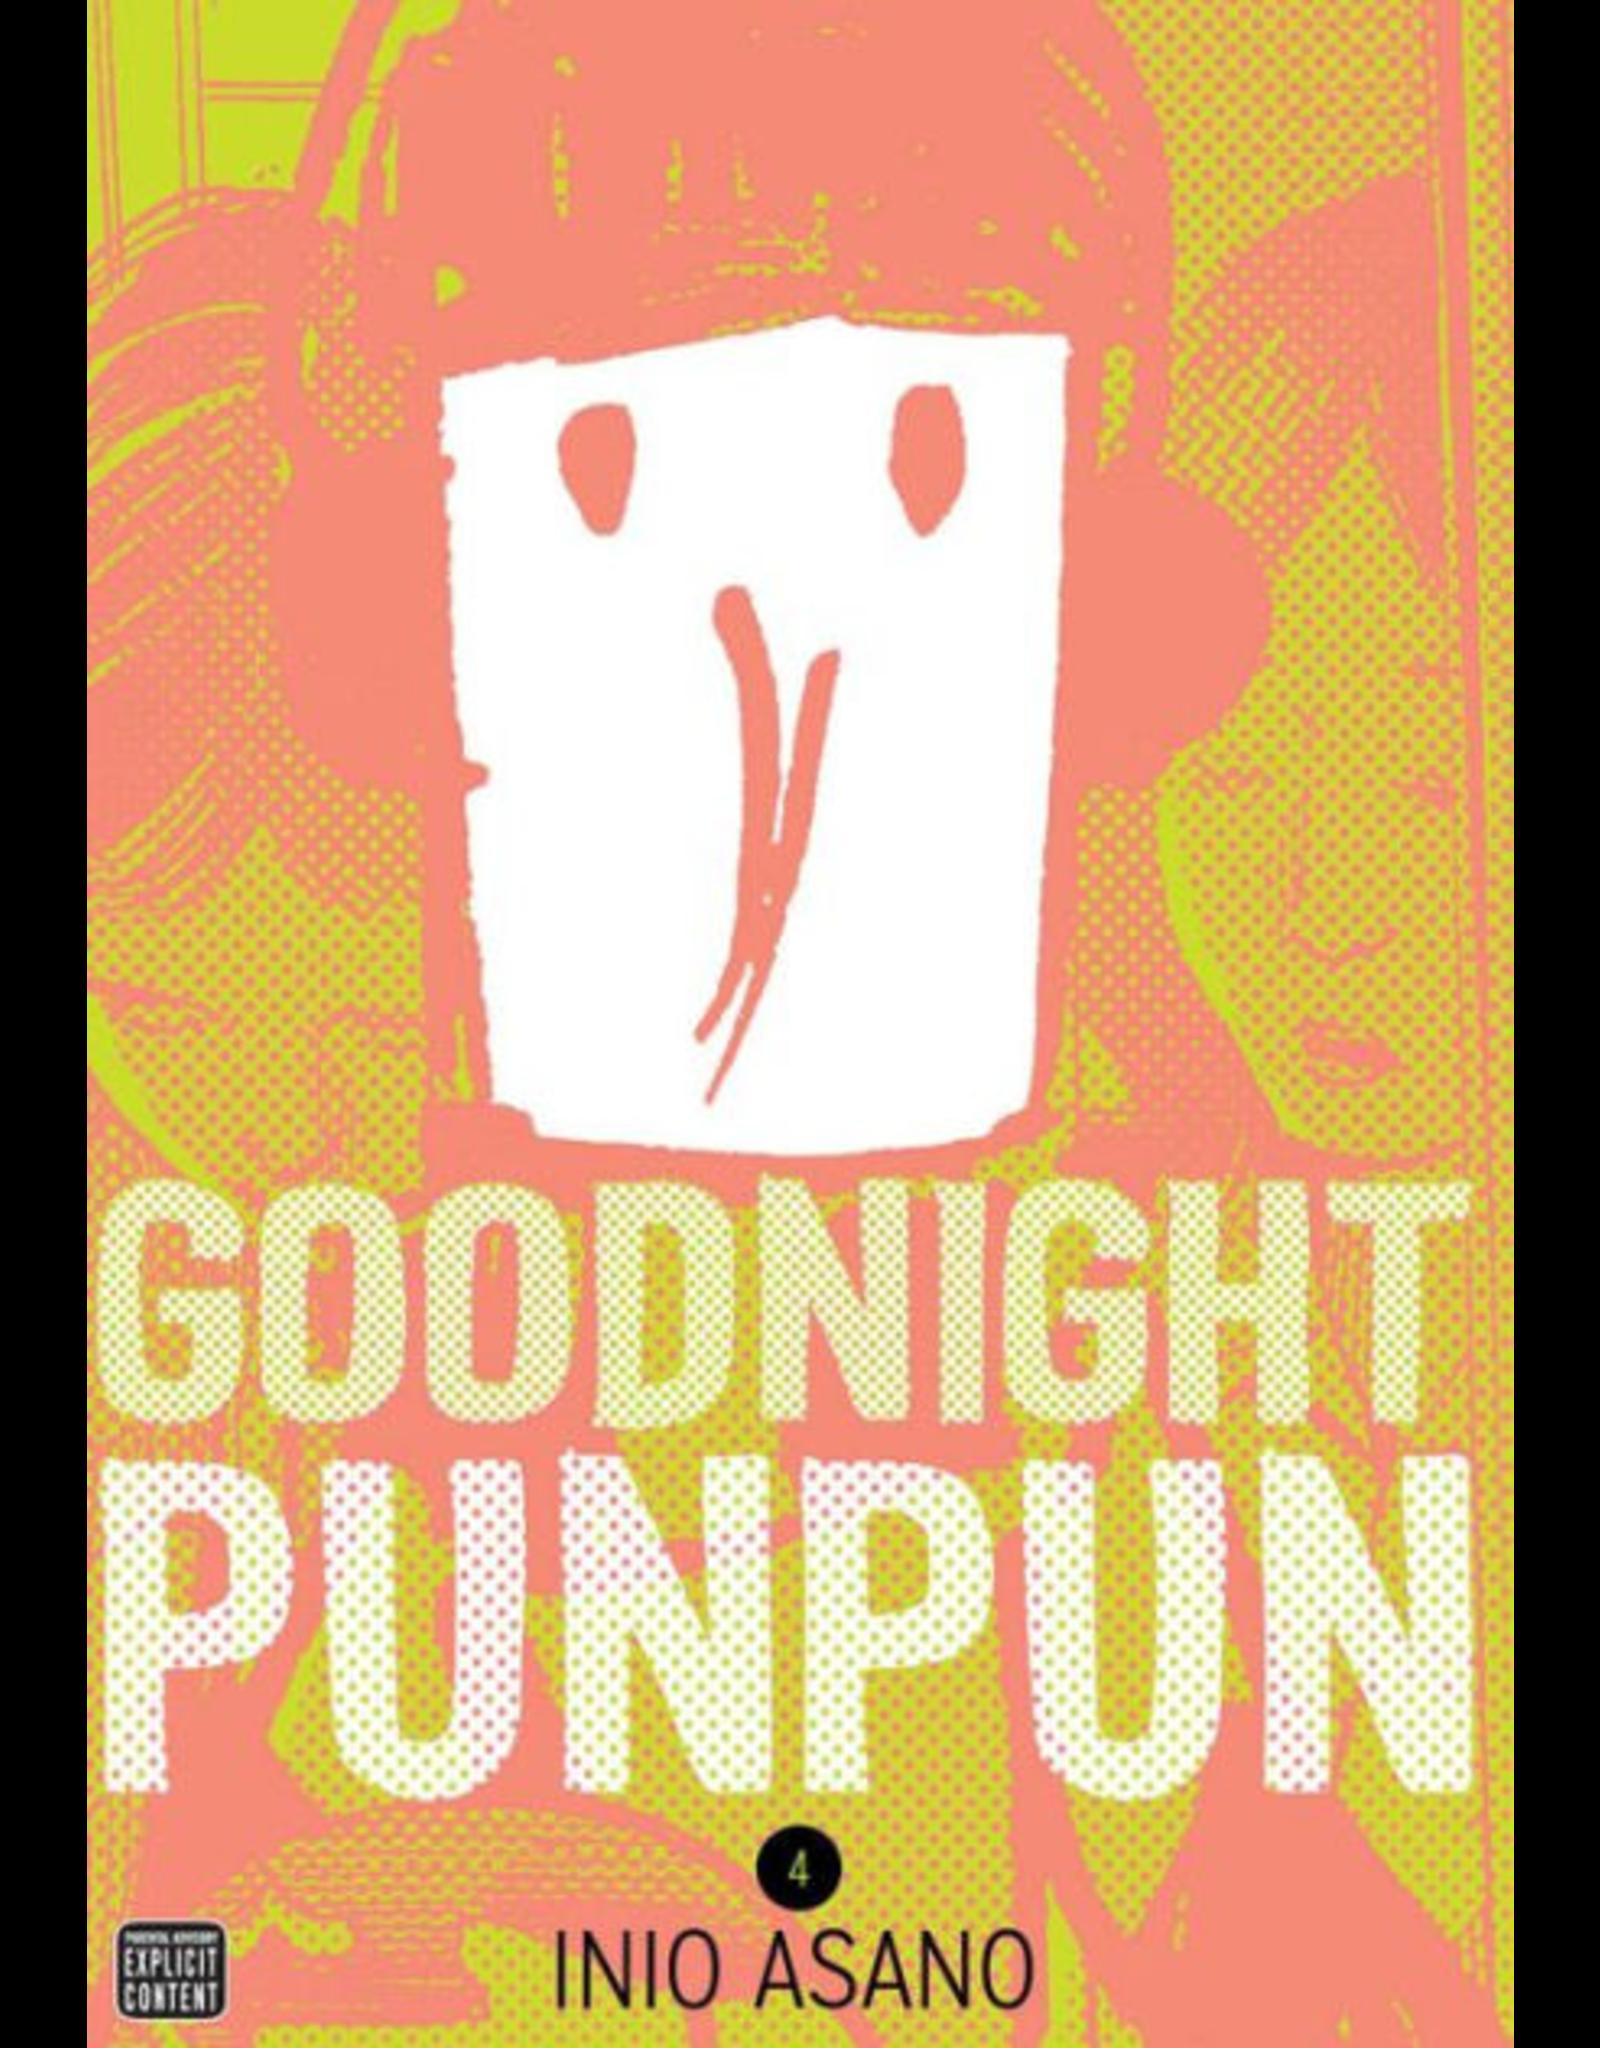 Goodnight Punpun 4 (Engelstalig) - Manga